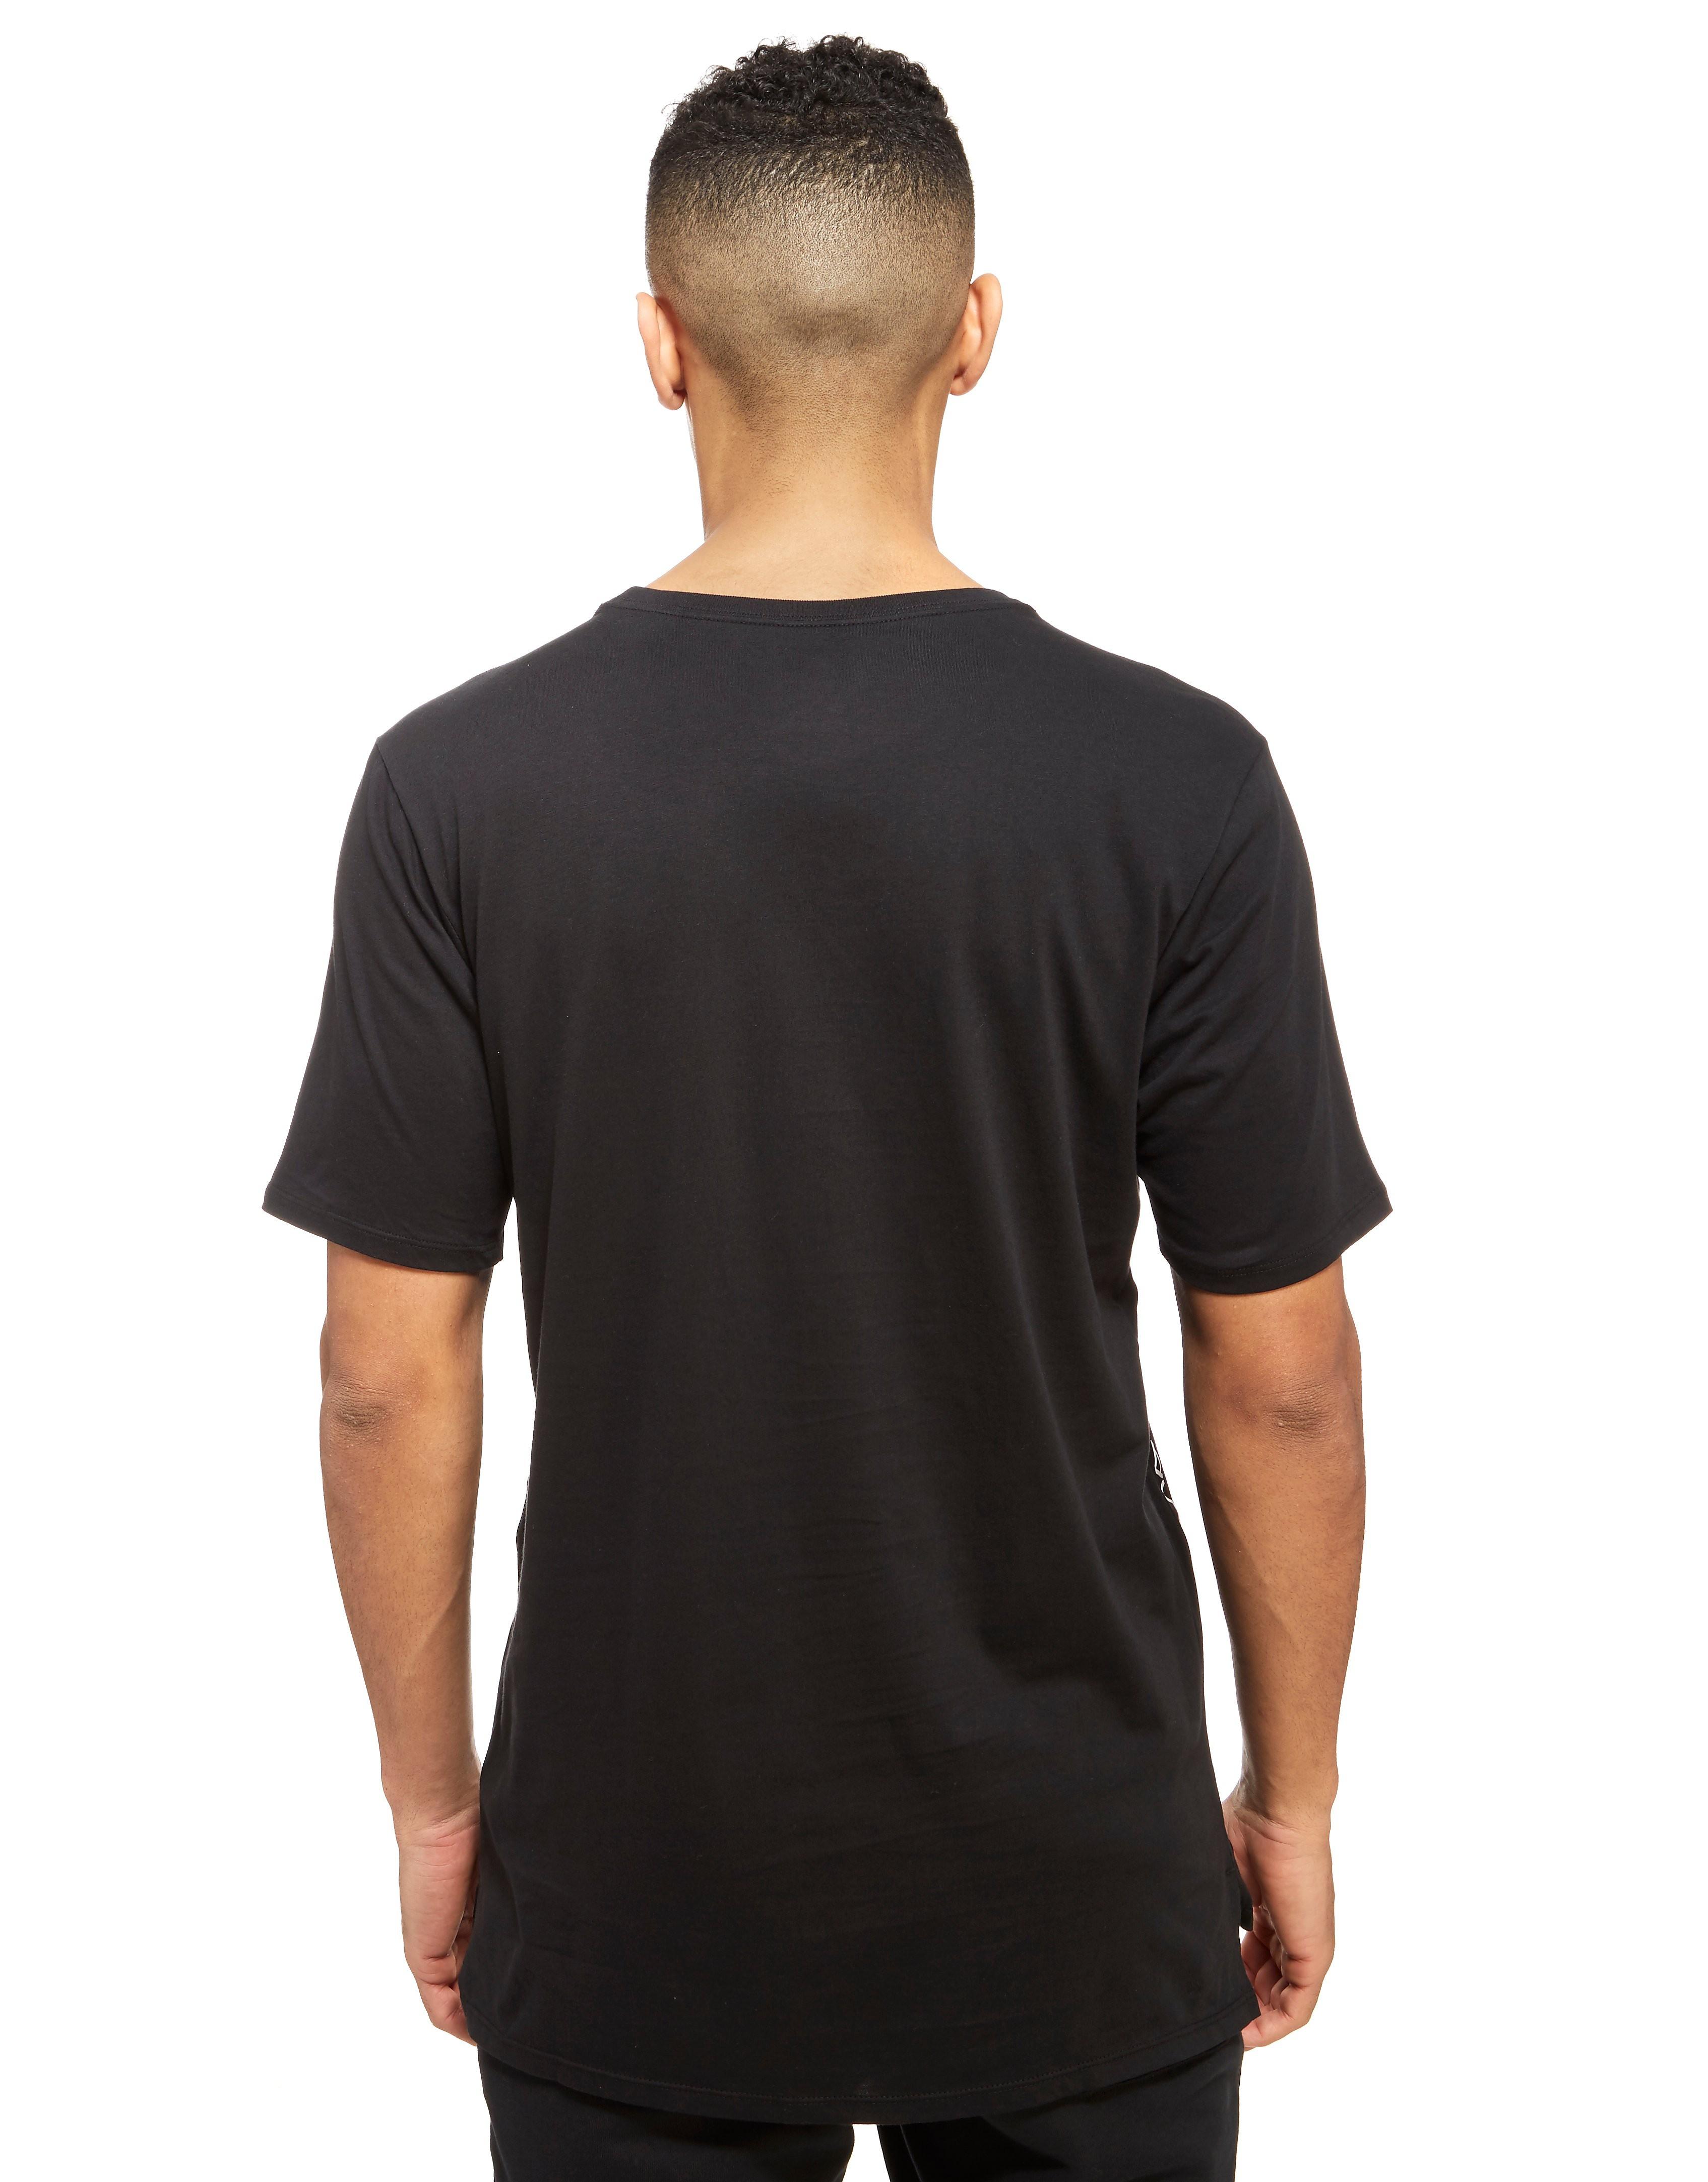 Nike Air Max Tape T-Shirt